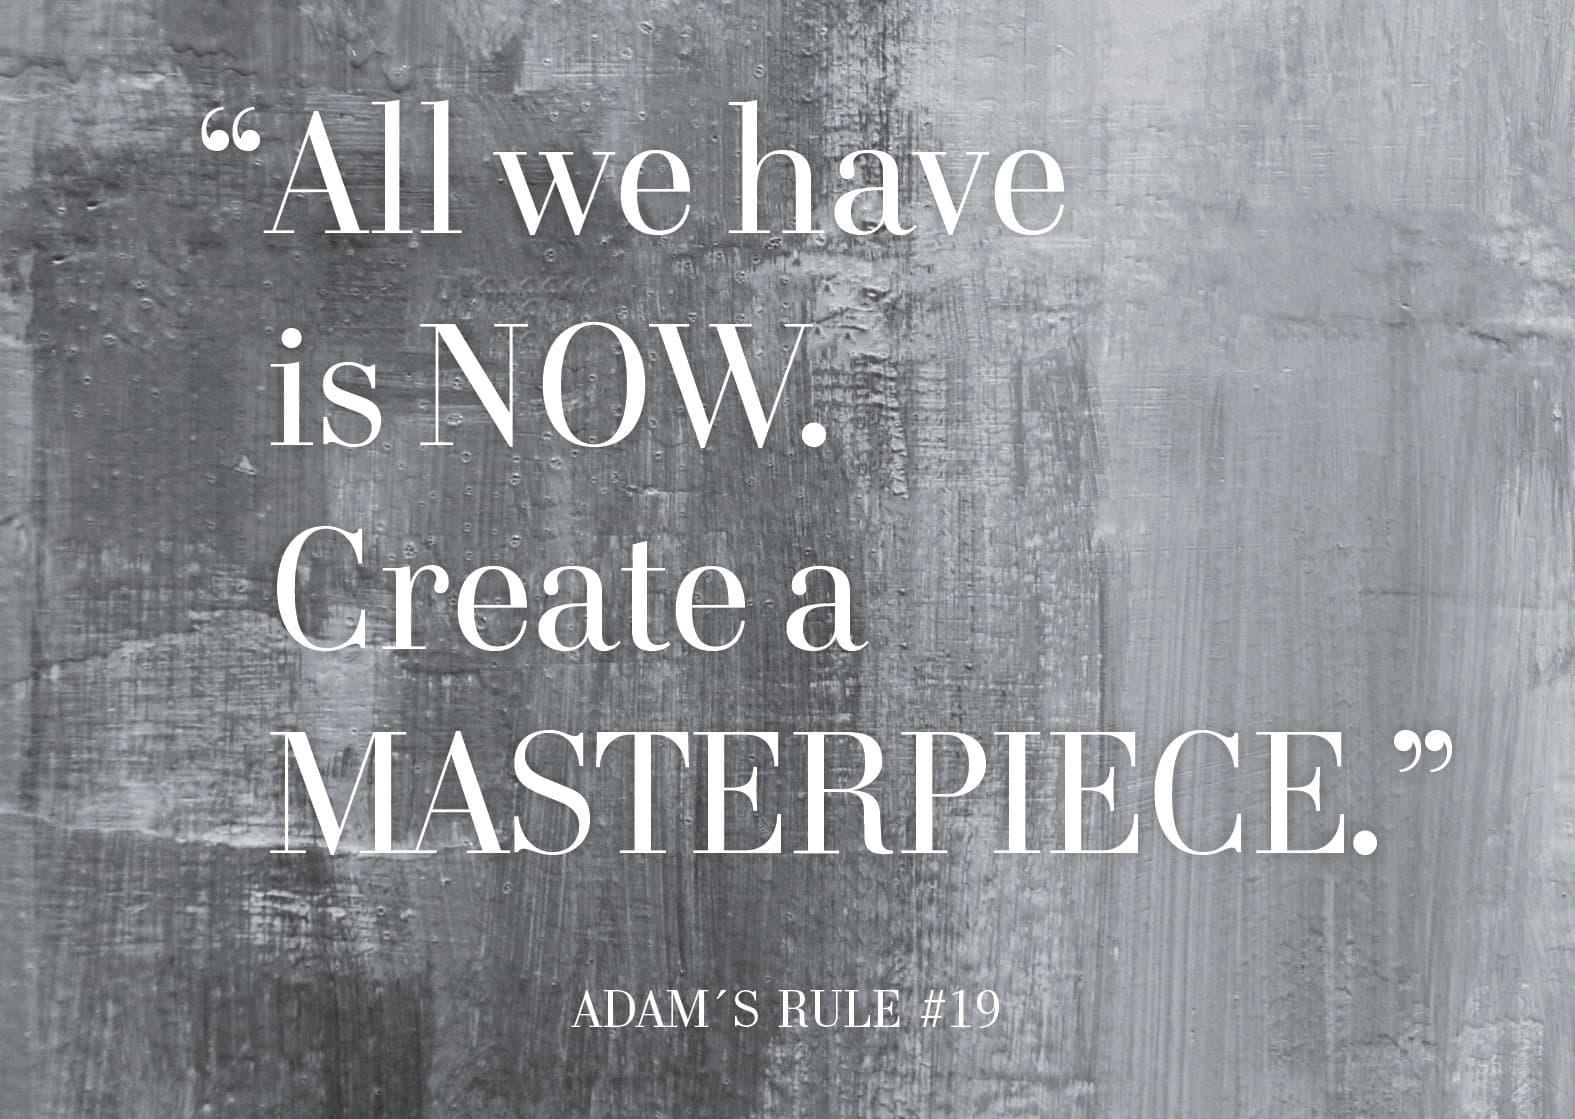 Adam's Rule #19